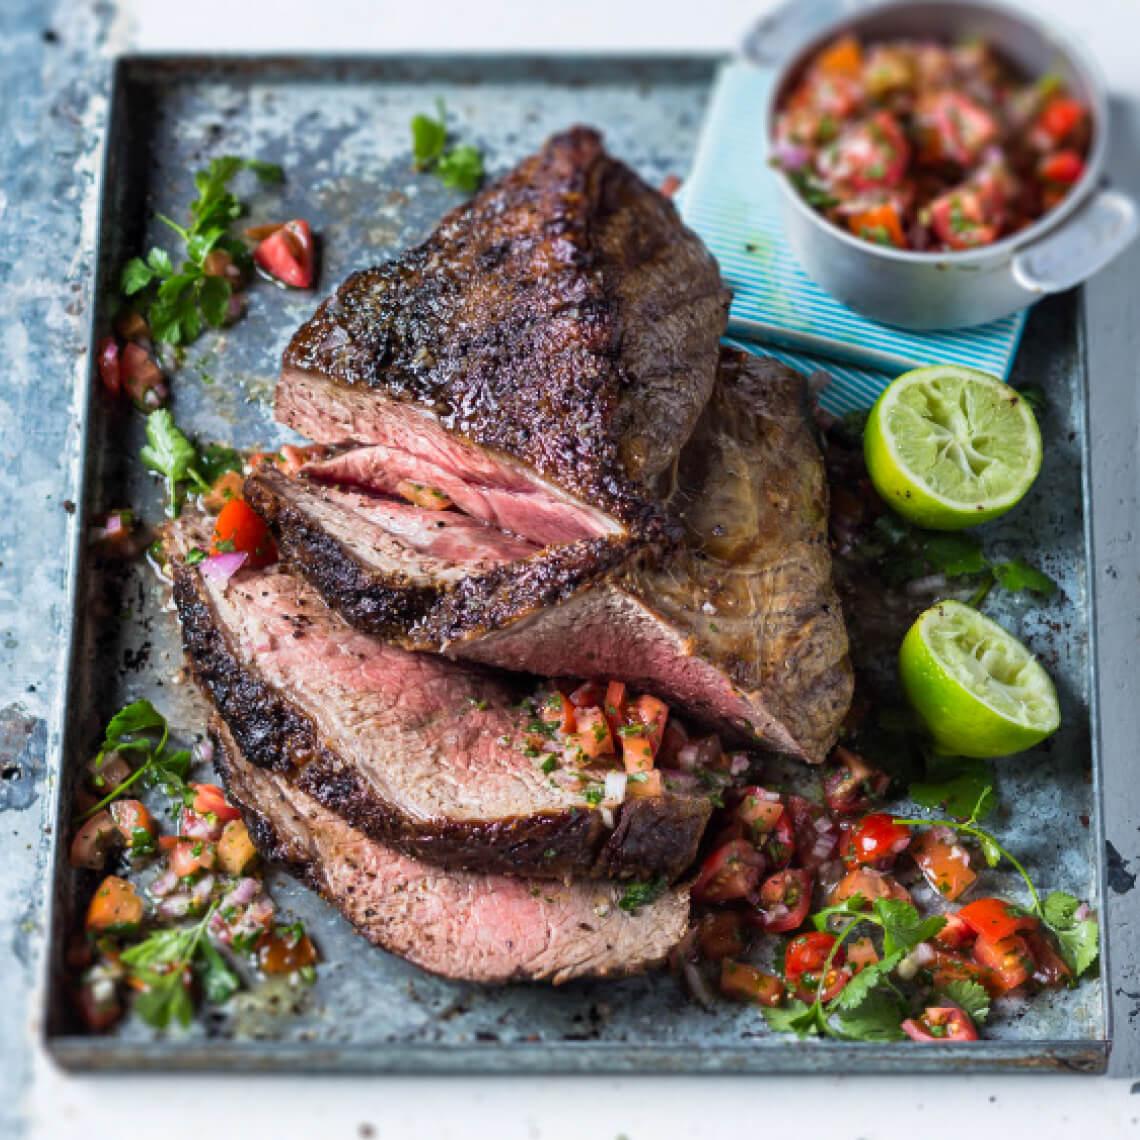 Salt and pepper rump steak with pico de gallo